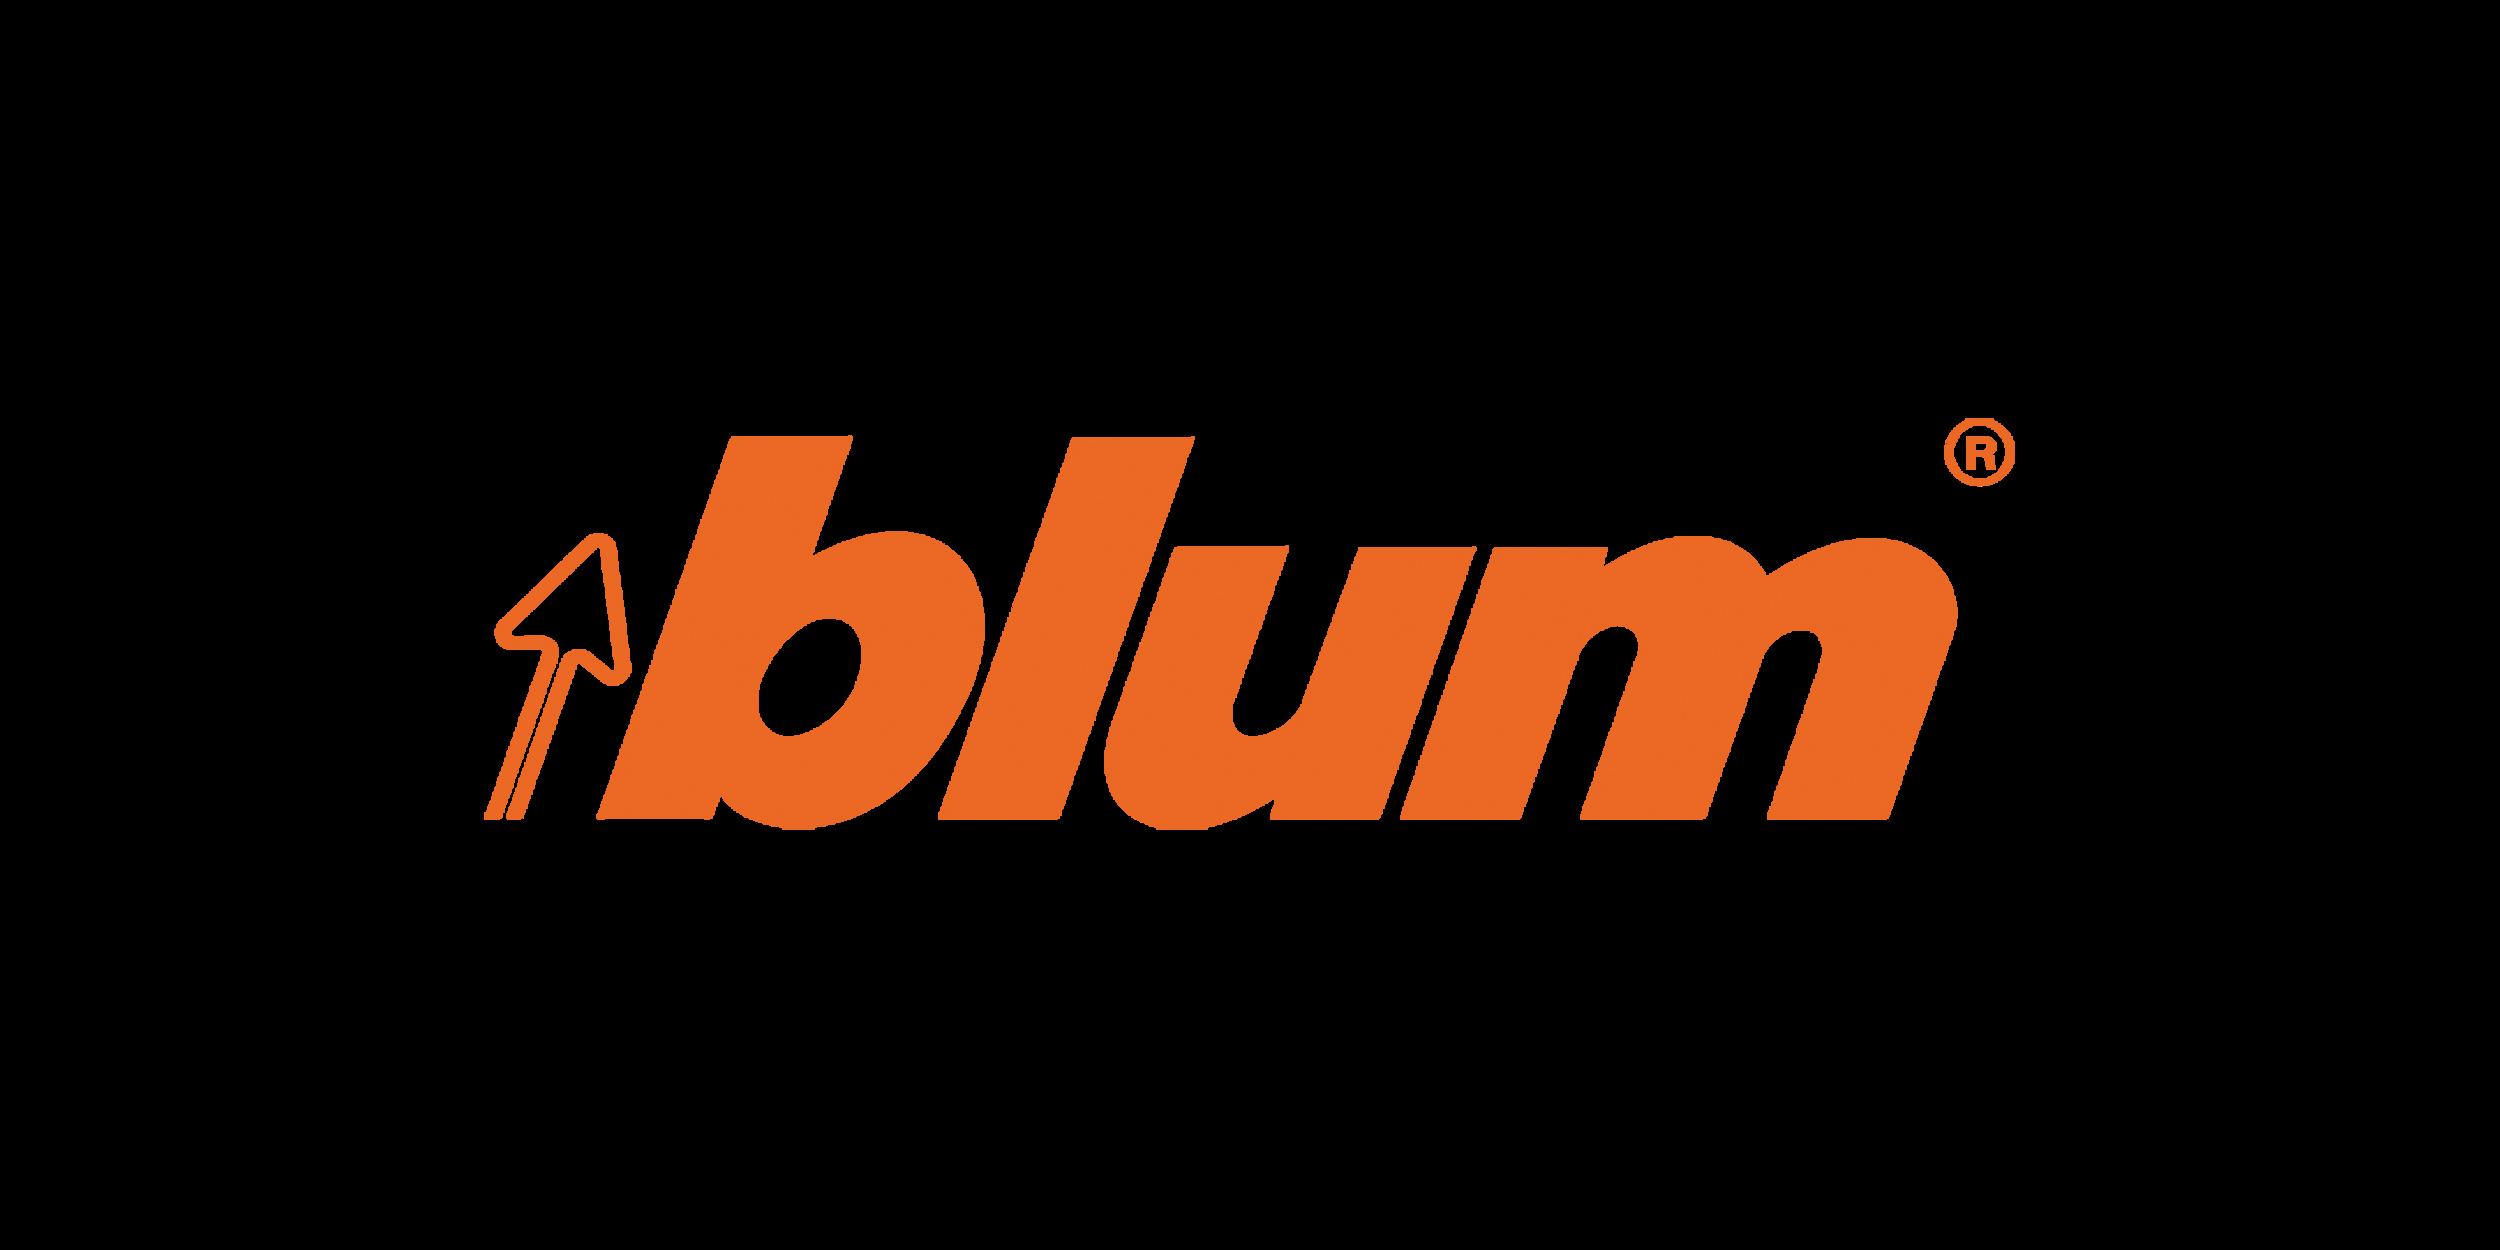 BLUM_RGB_300DPI_PNG_(orange_no_background).png